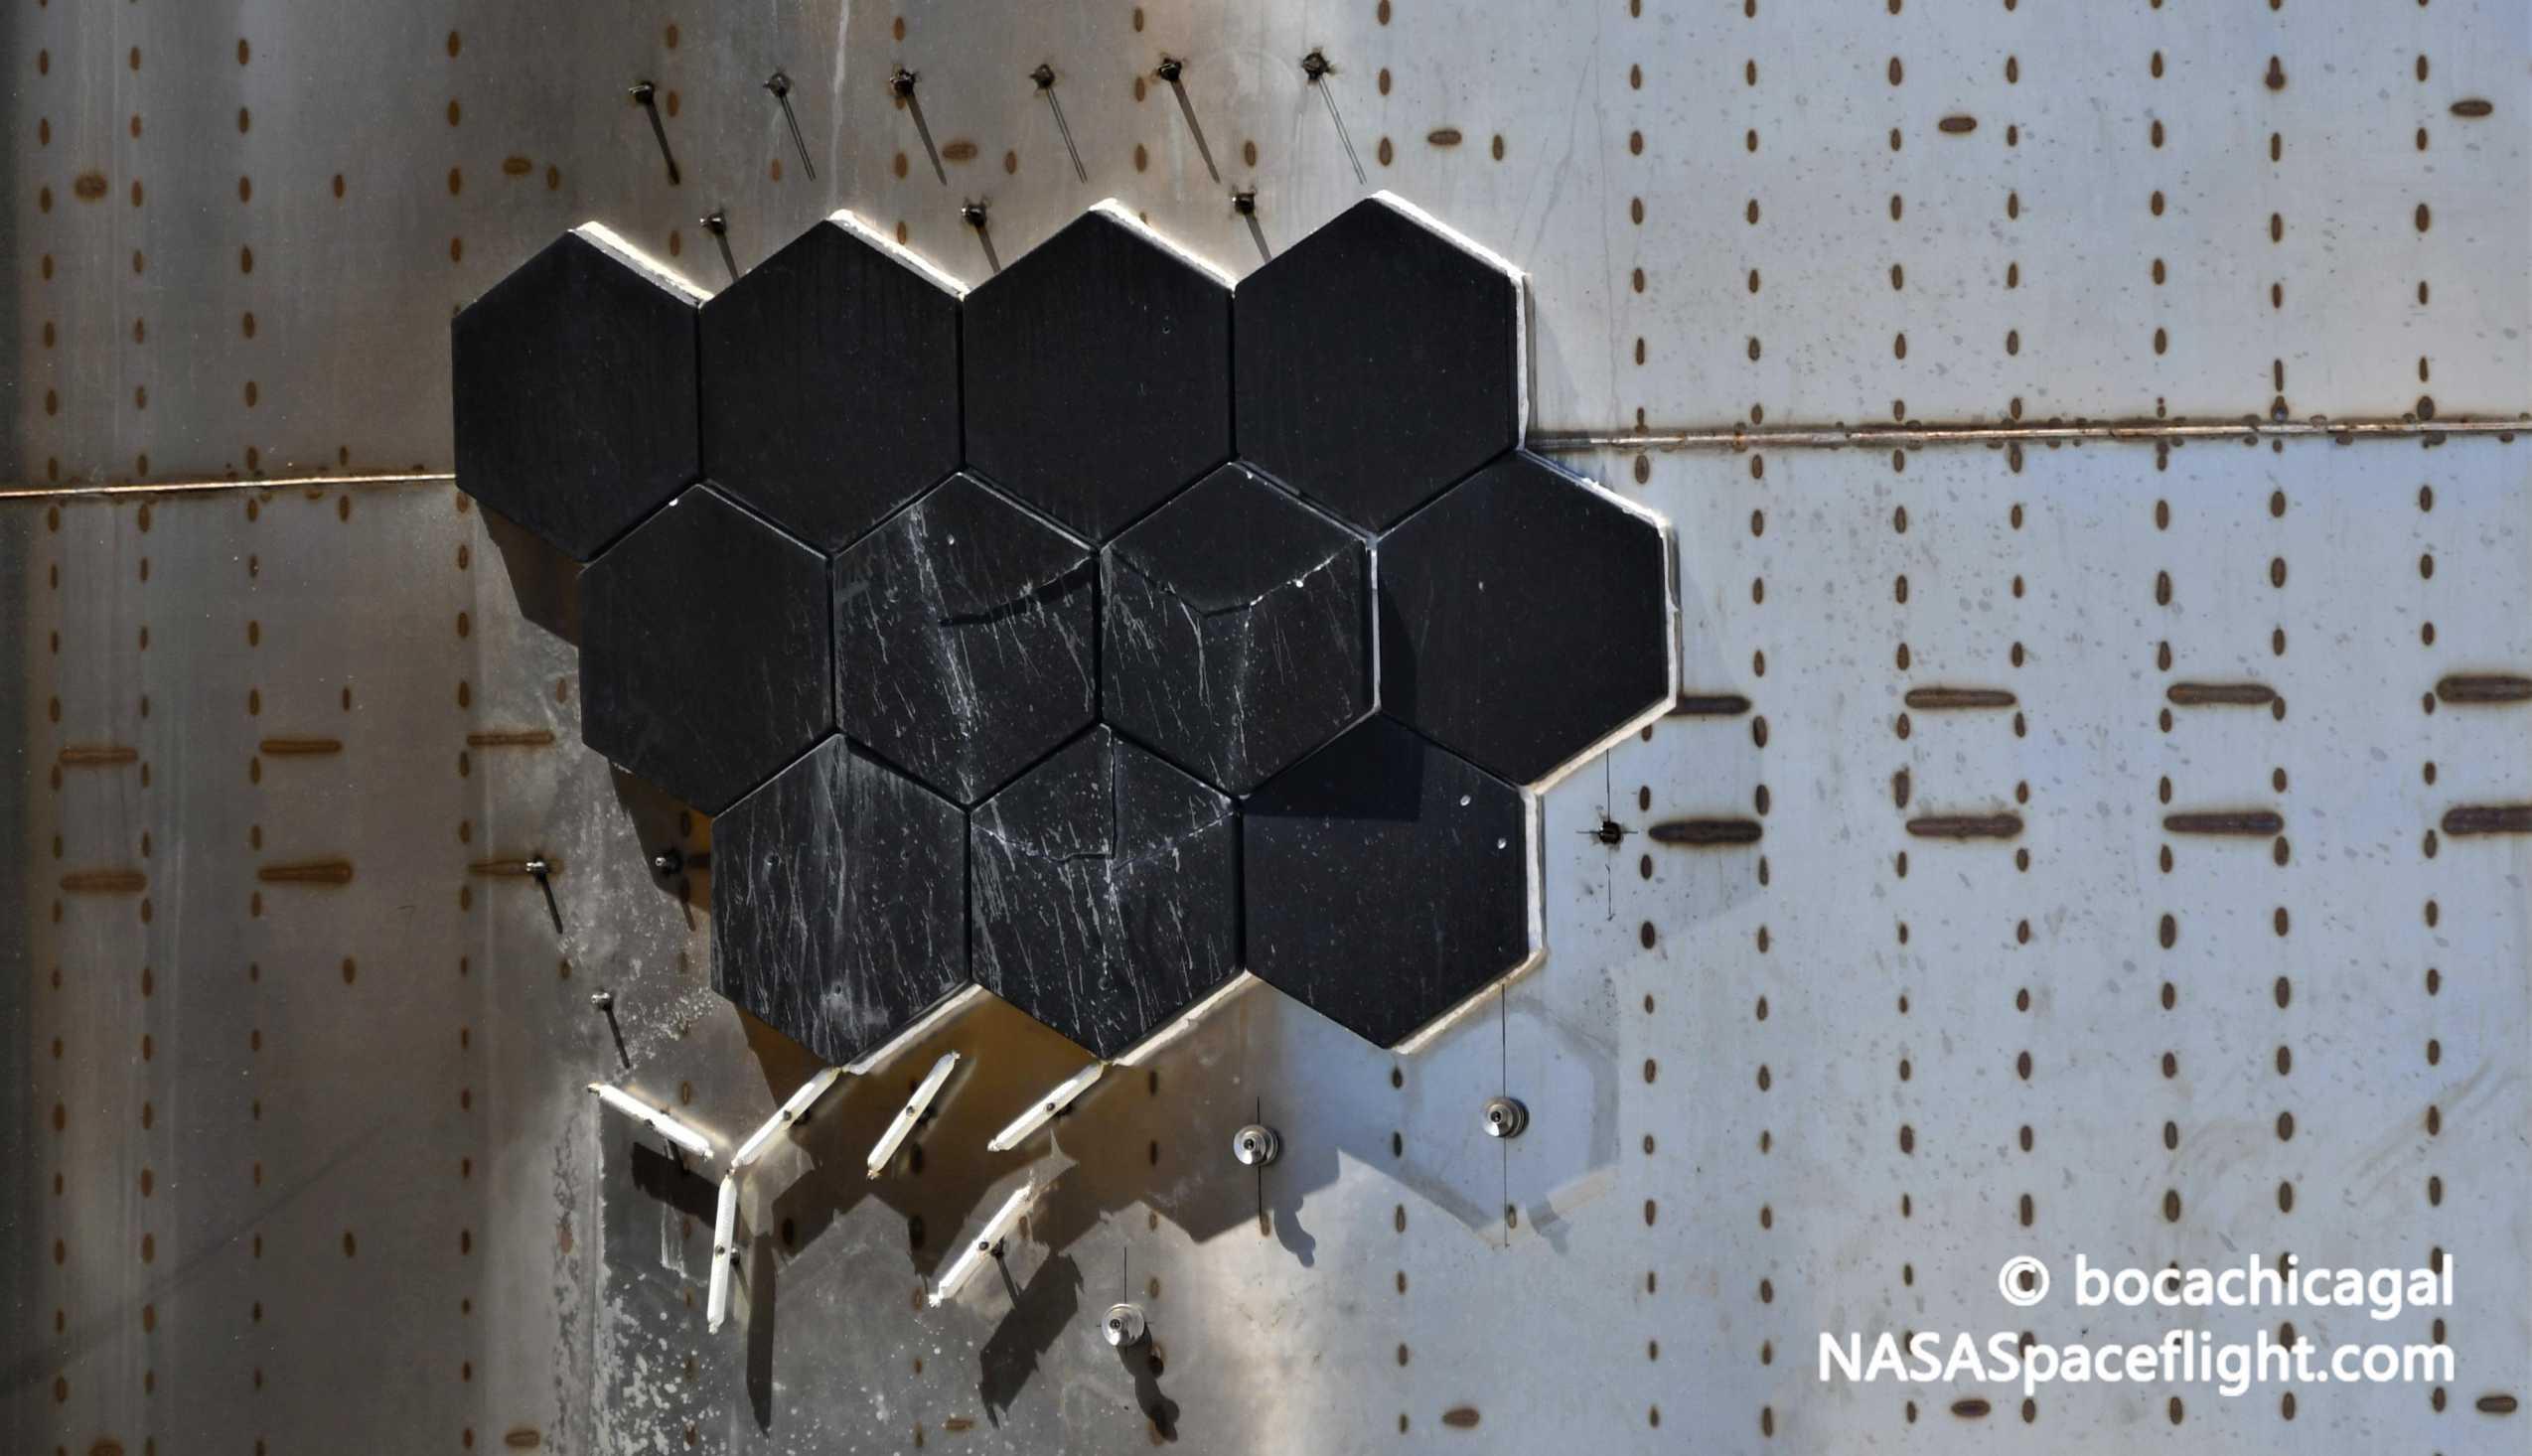 Starship Boca Chica 080720 (NASASpaceflight – bocachicagal) SN5 tile damage 1 crop (c)